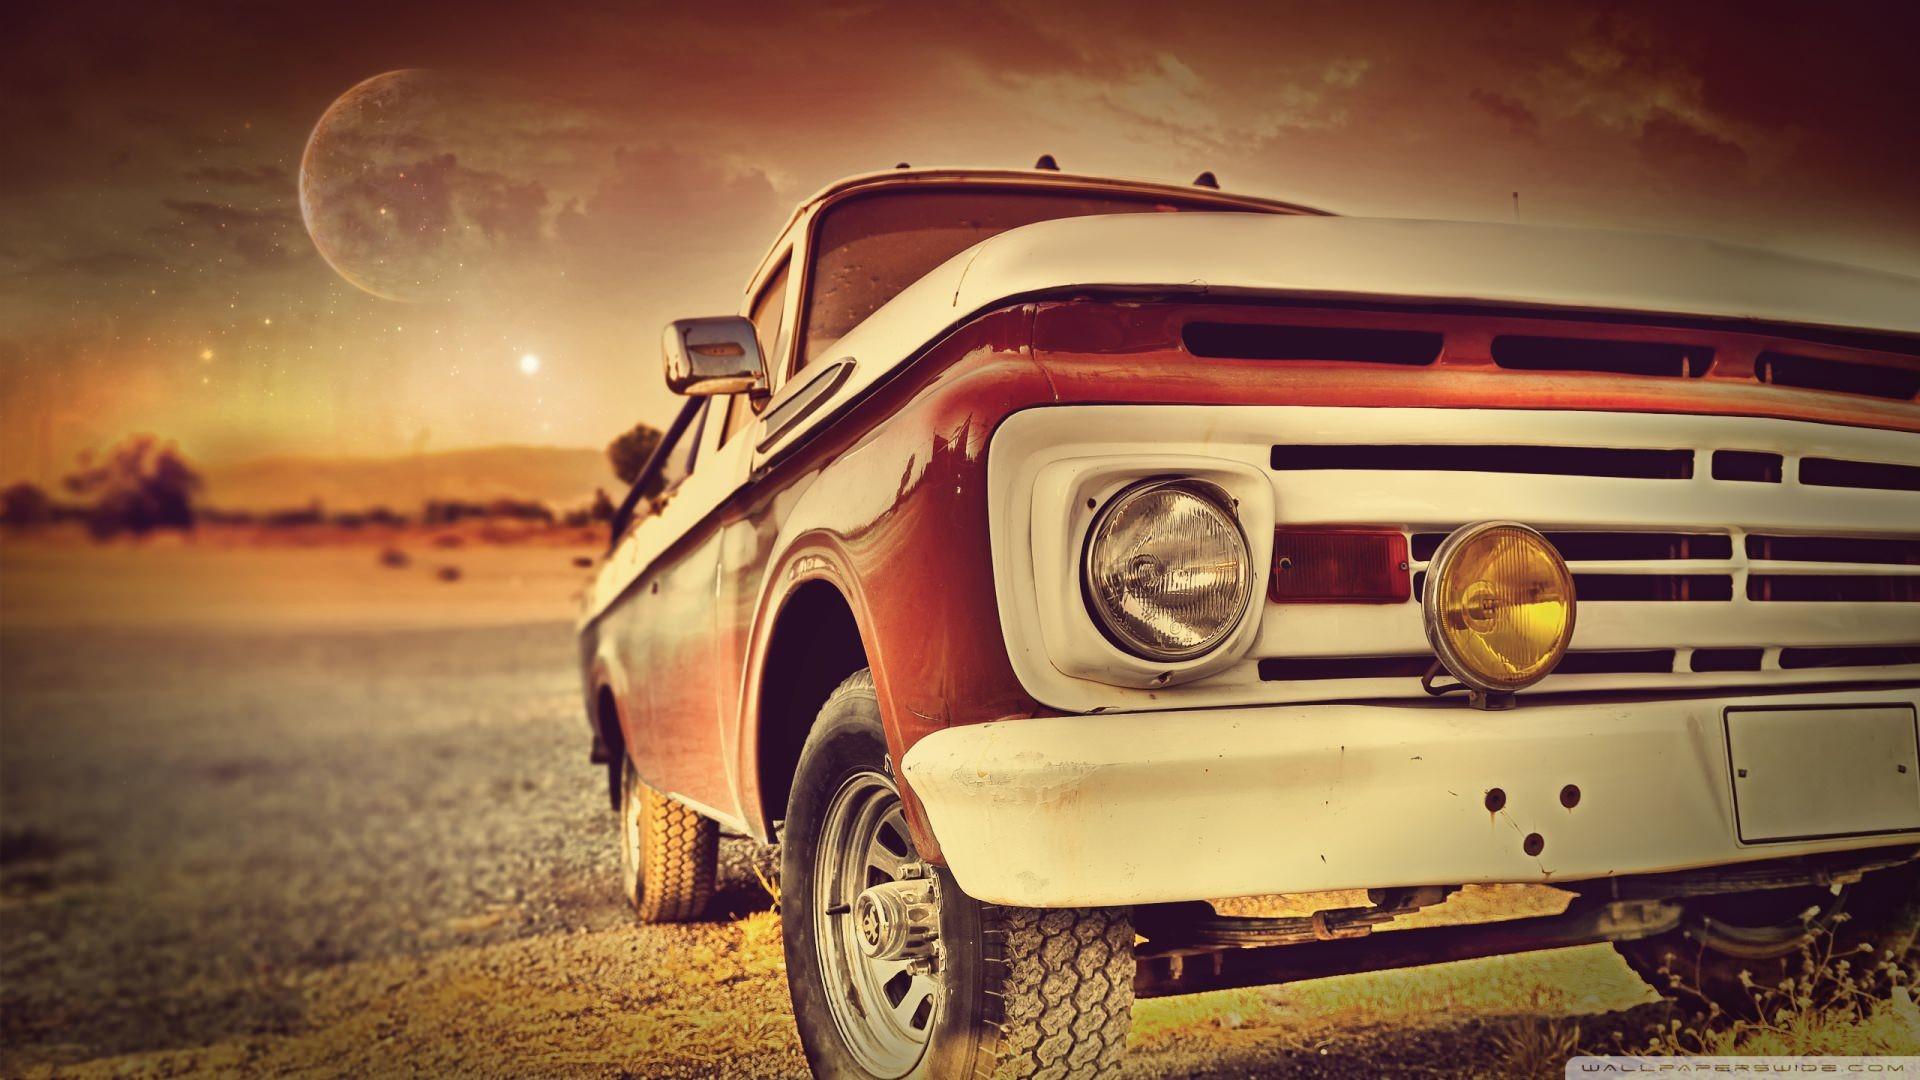 Cool Vintage HD Car Photography Wallpaper